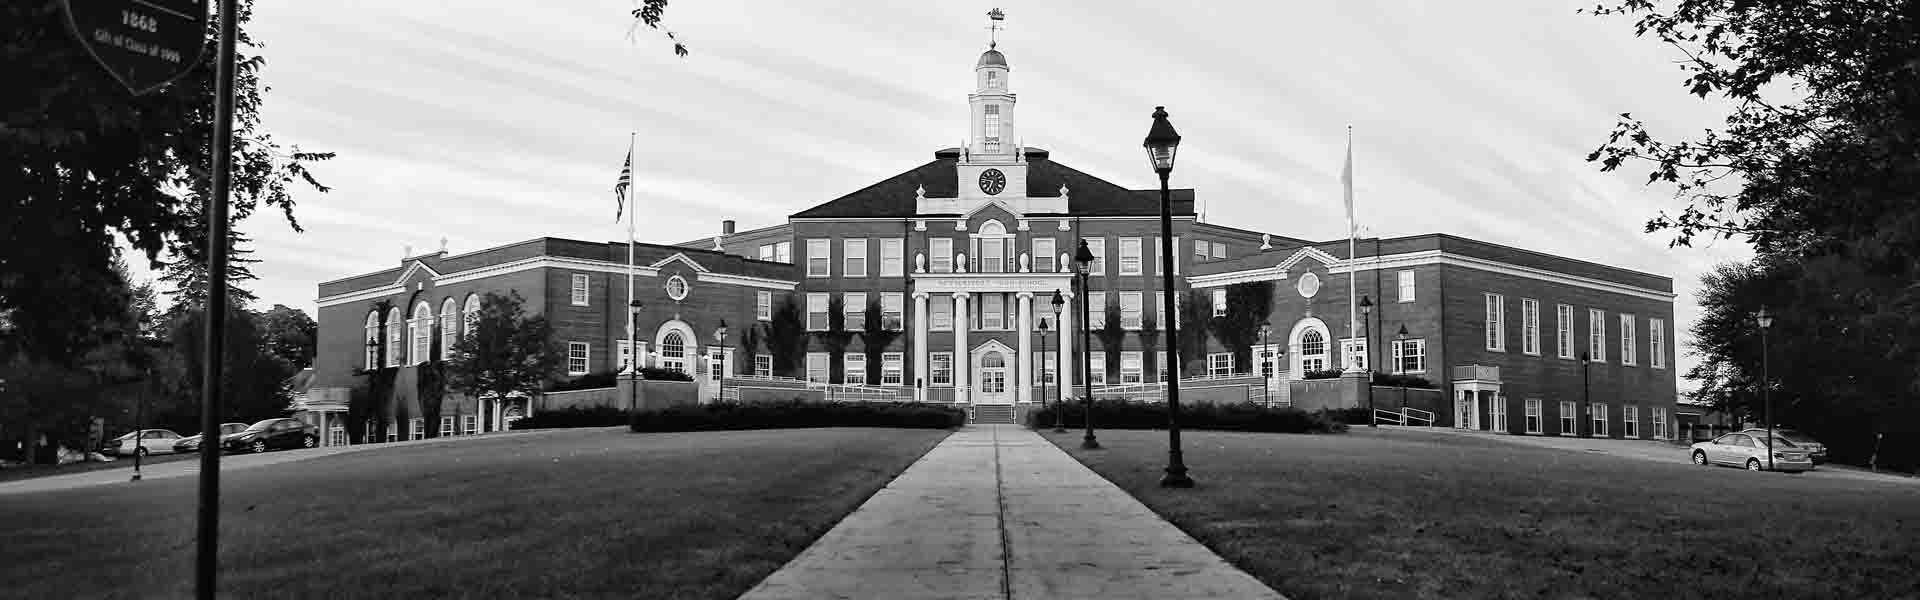 Newburyport High School Massachusetts USA School Banner 2019